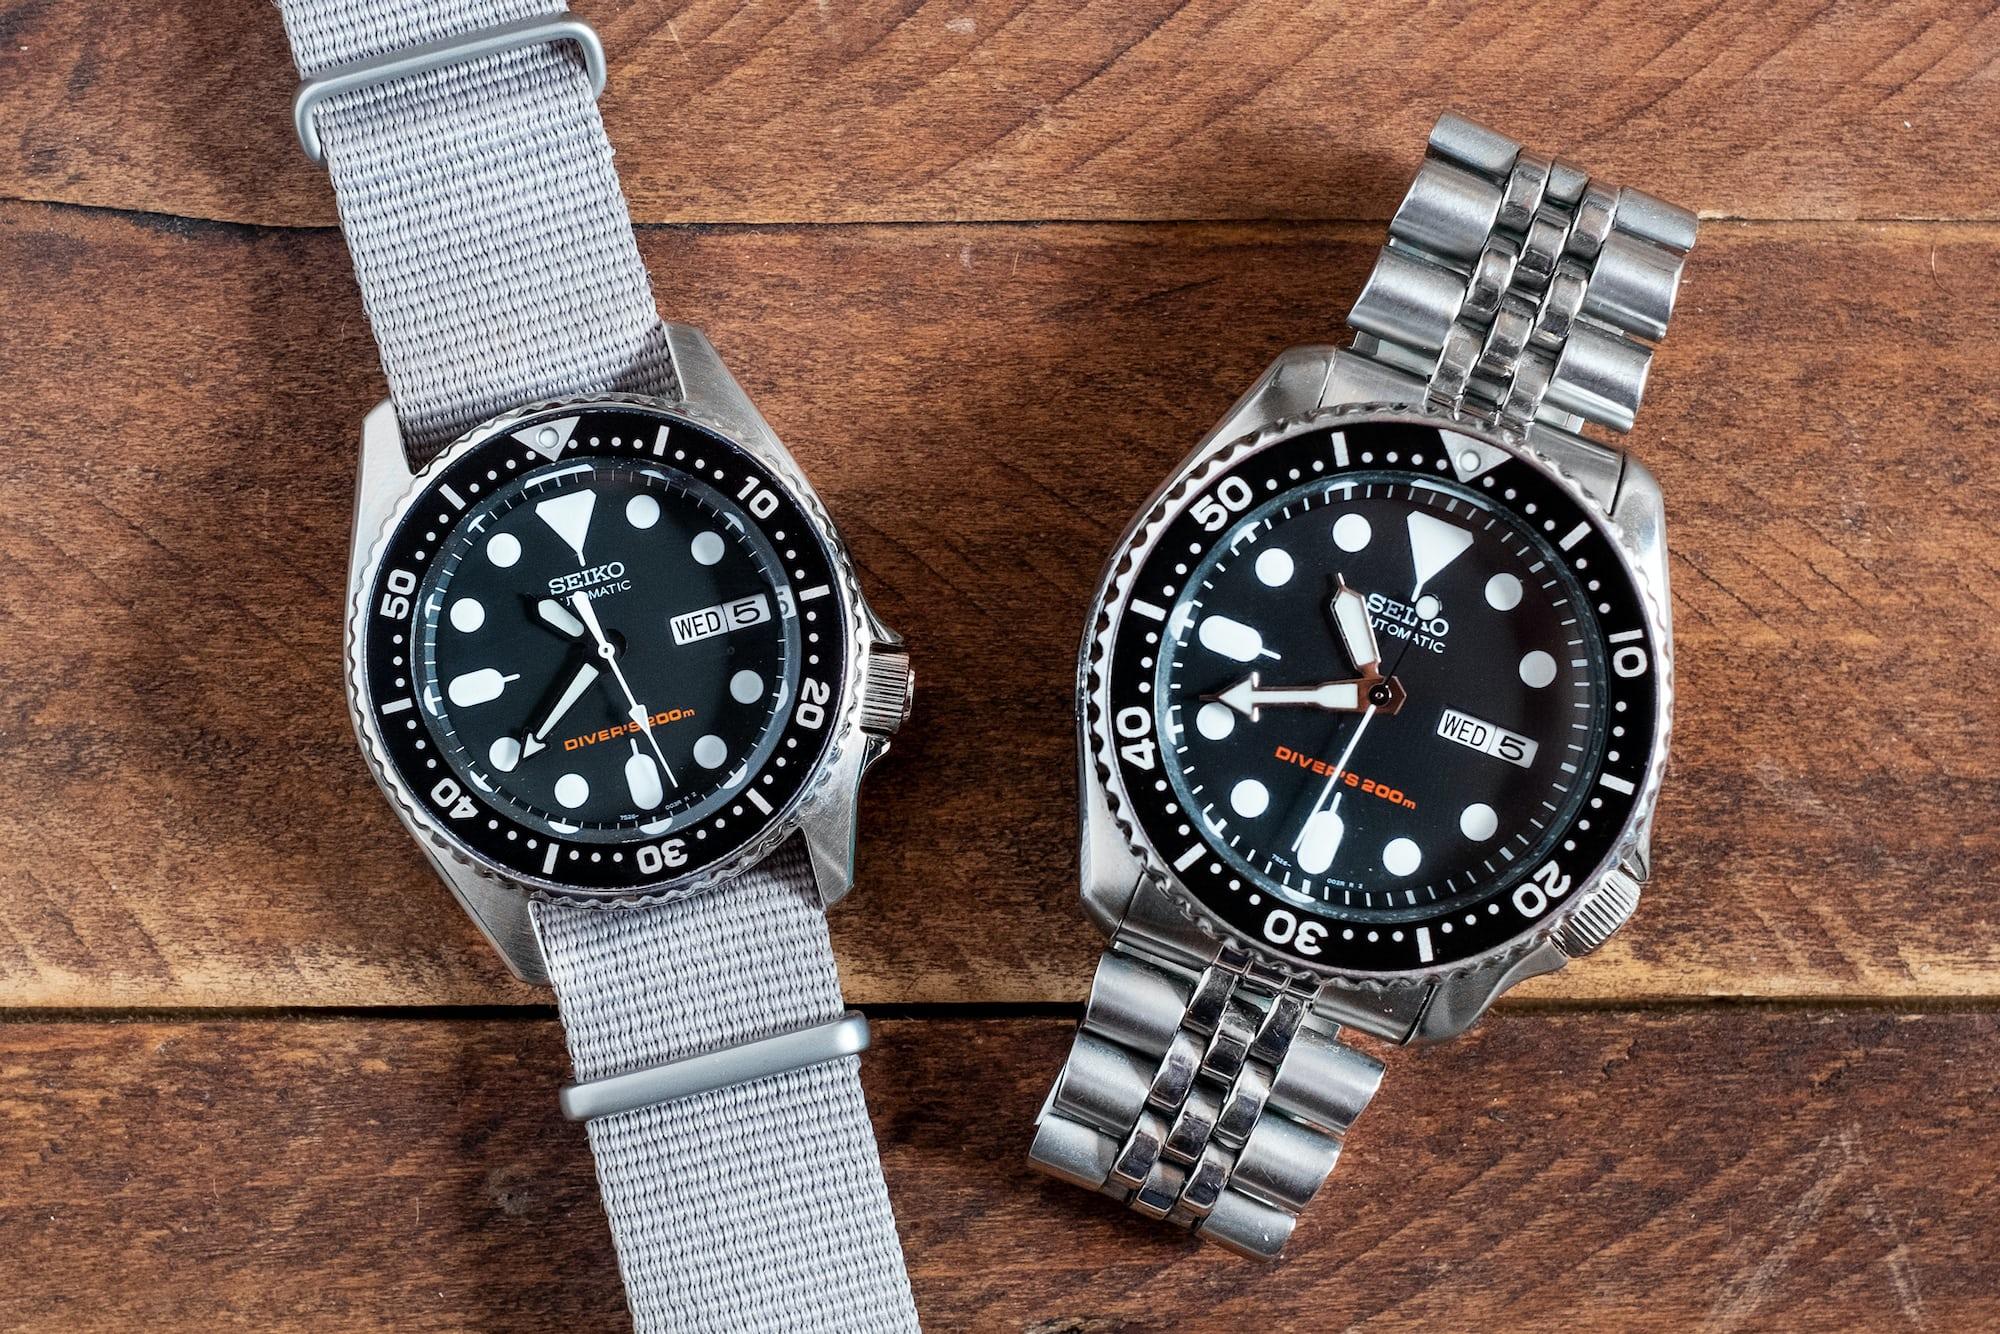 The Value Proposition: The Seiko SKX013 Dive Watch DSCF9406